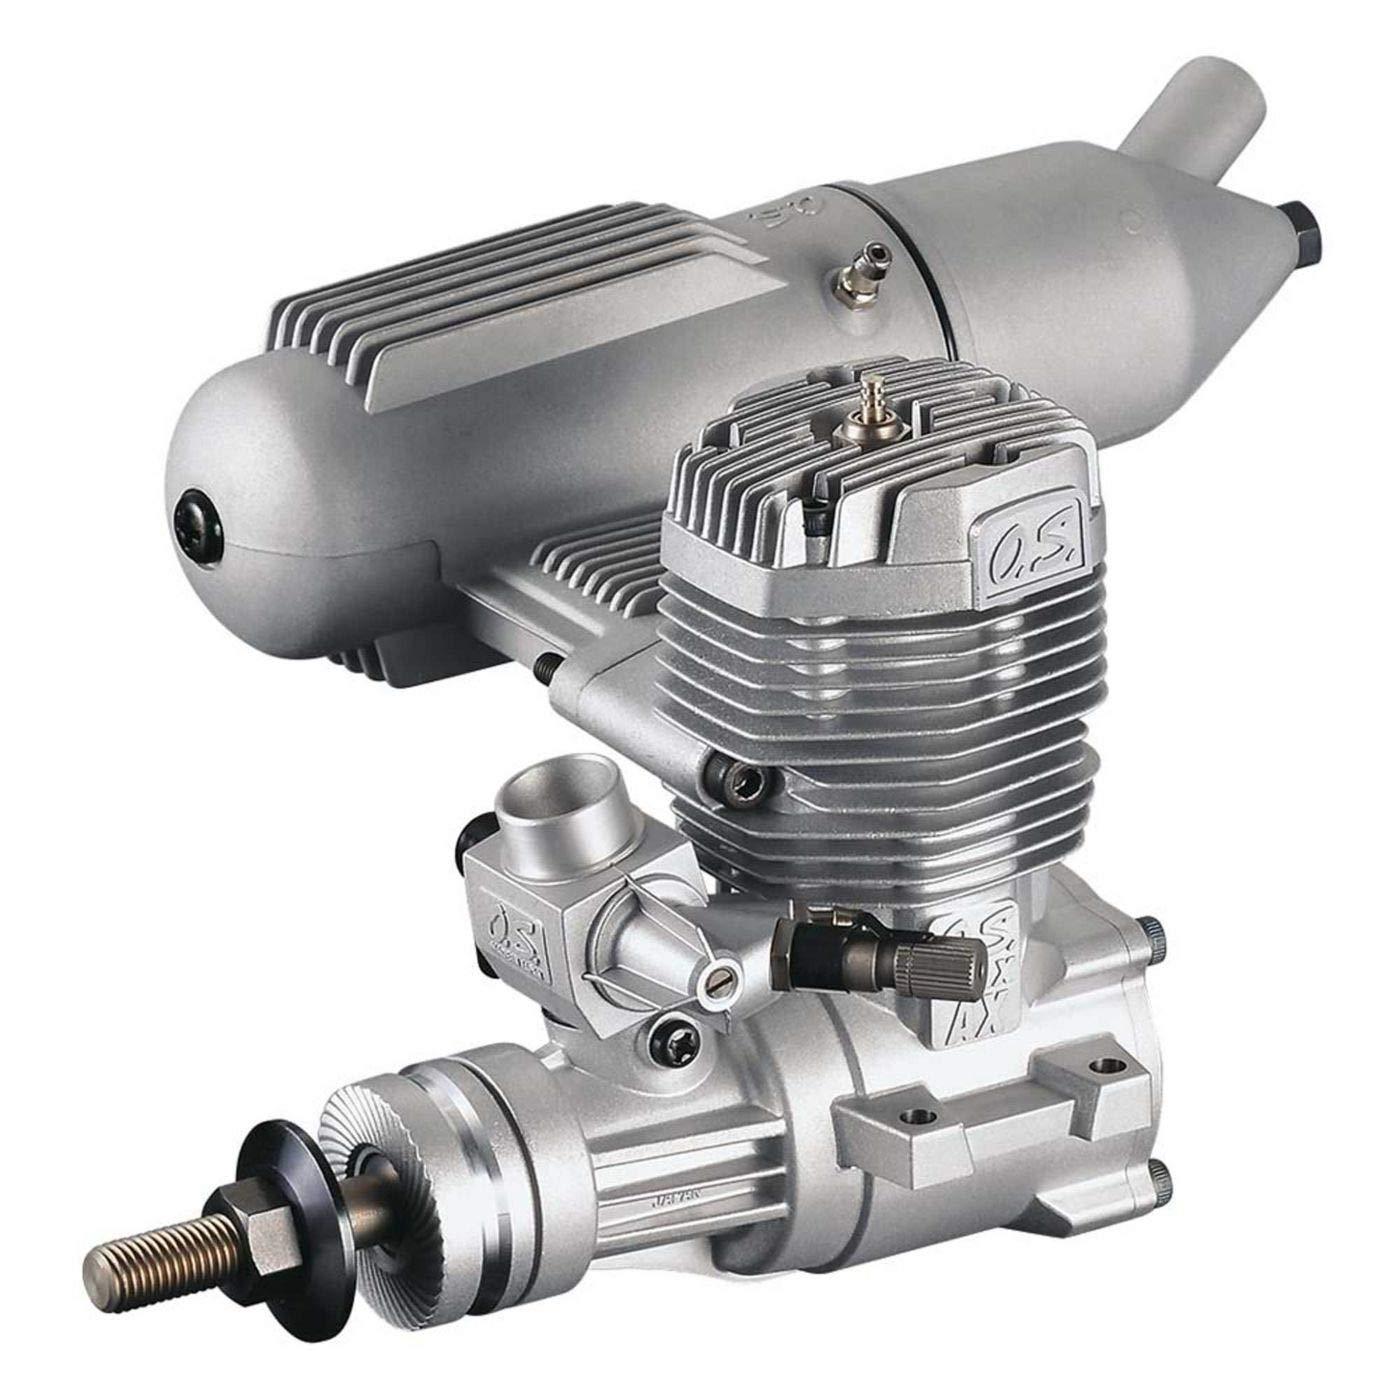 O.S. 65AX Glow-Powered Aircraft Engine with Advanced Bimetallic Liner and E-4010A Muffler